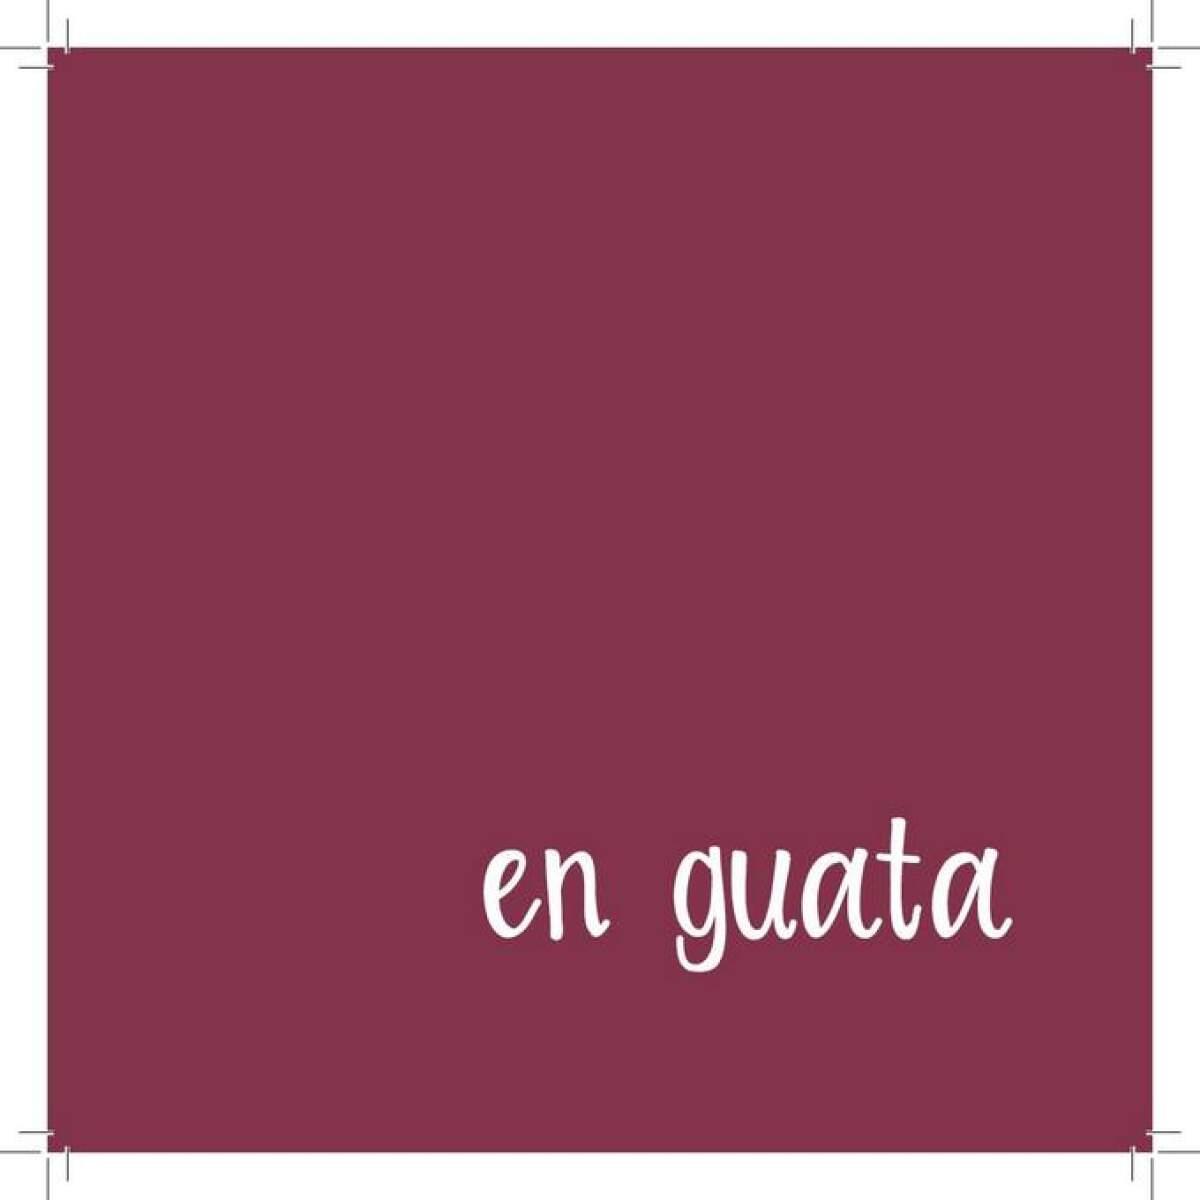 en-guata-page-001